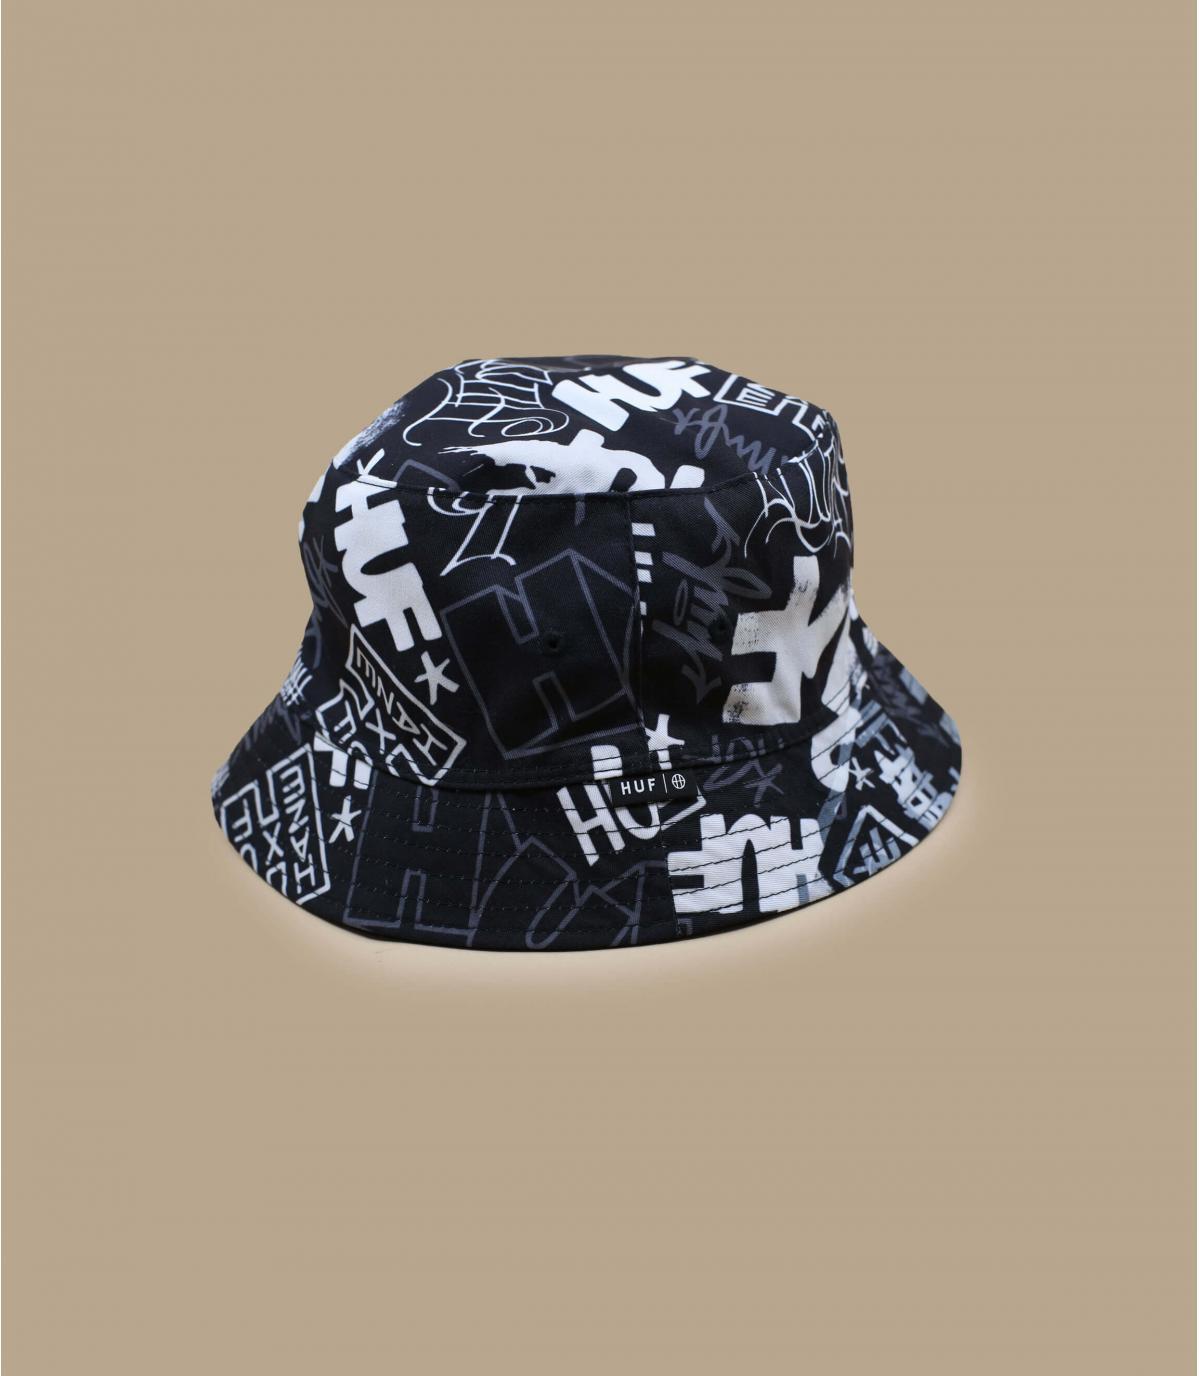 Black Huf bucket